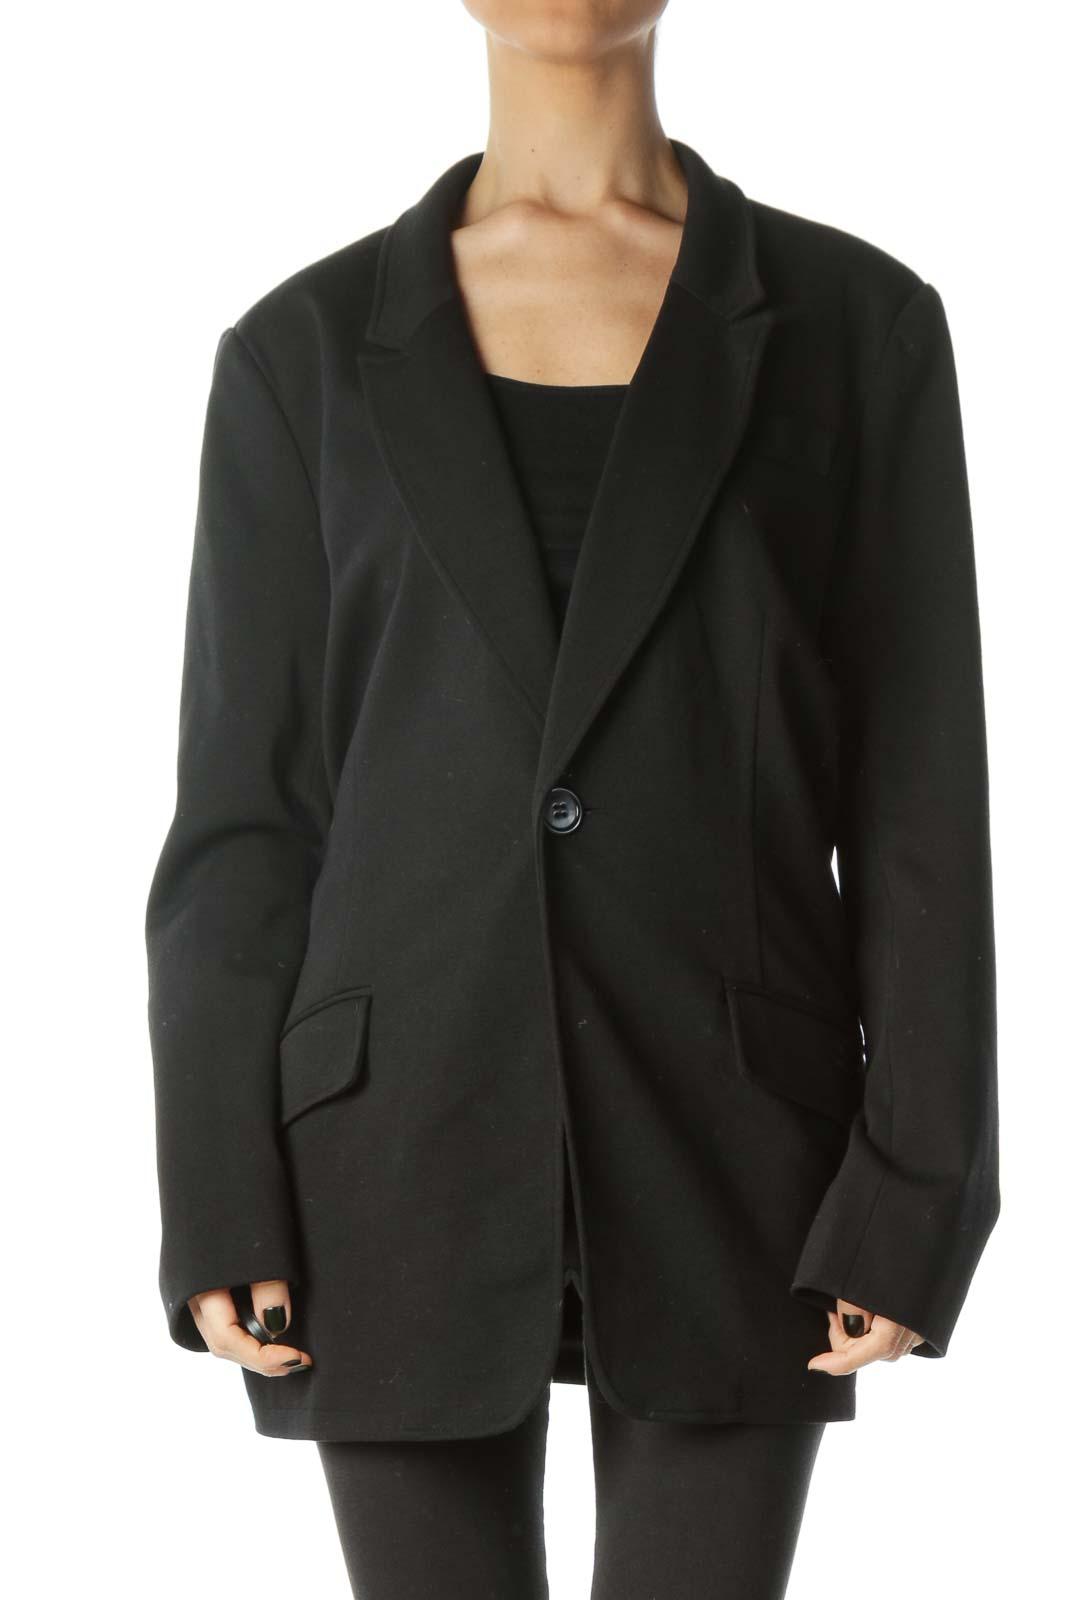 Black Collared V-Neck Buttoned Blazer